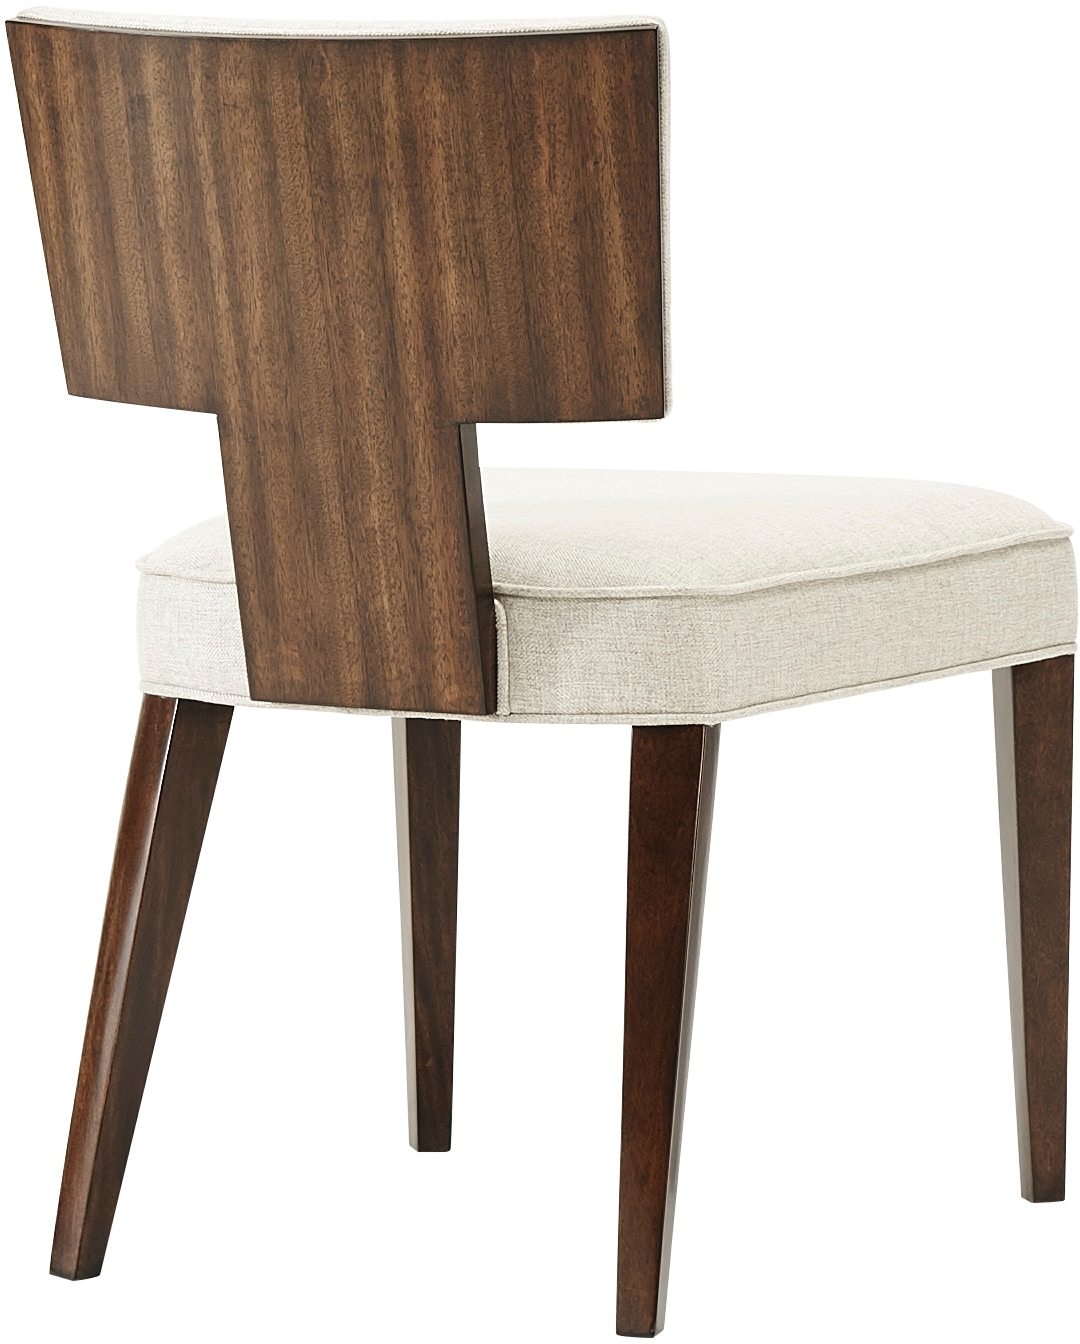 theodore alexander furniture 4005 053 1ajm dining room 55 broadway